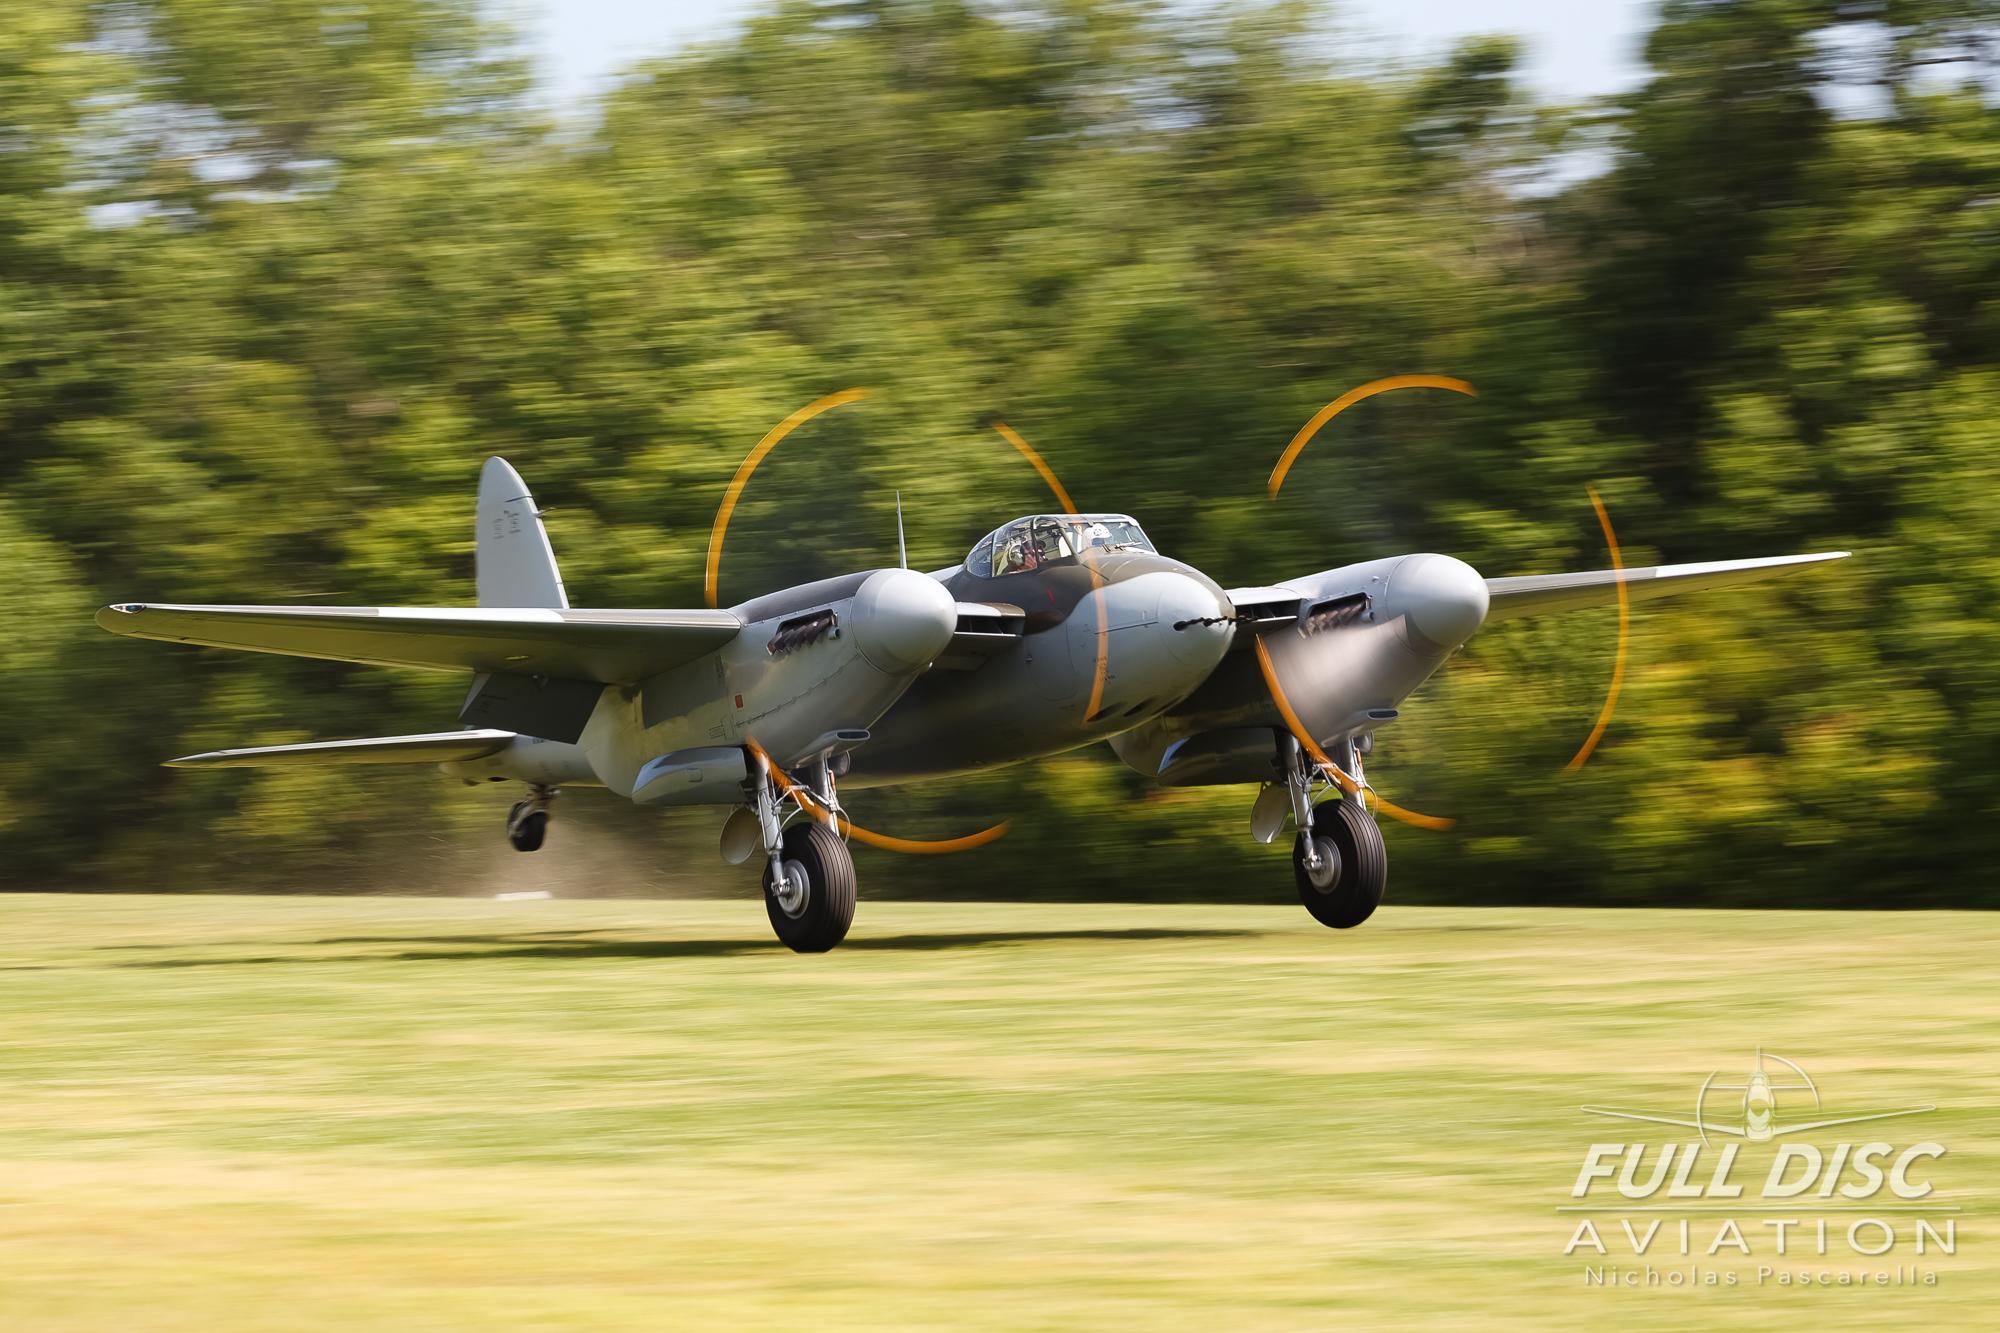 nickpascarella_nicholaspascarella_fulldiscaviation_aircraft_mosquito_dehavilland.jpg